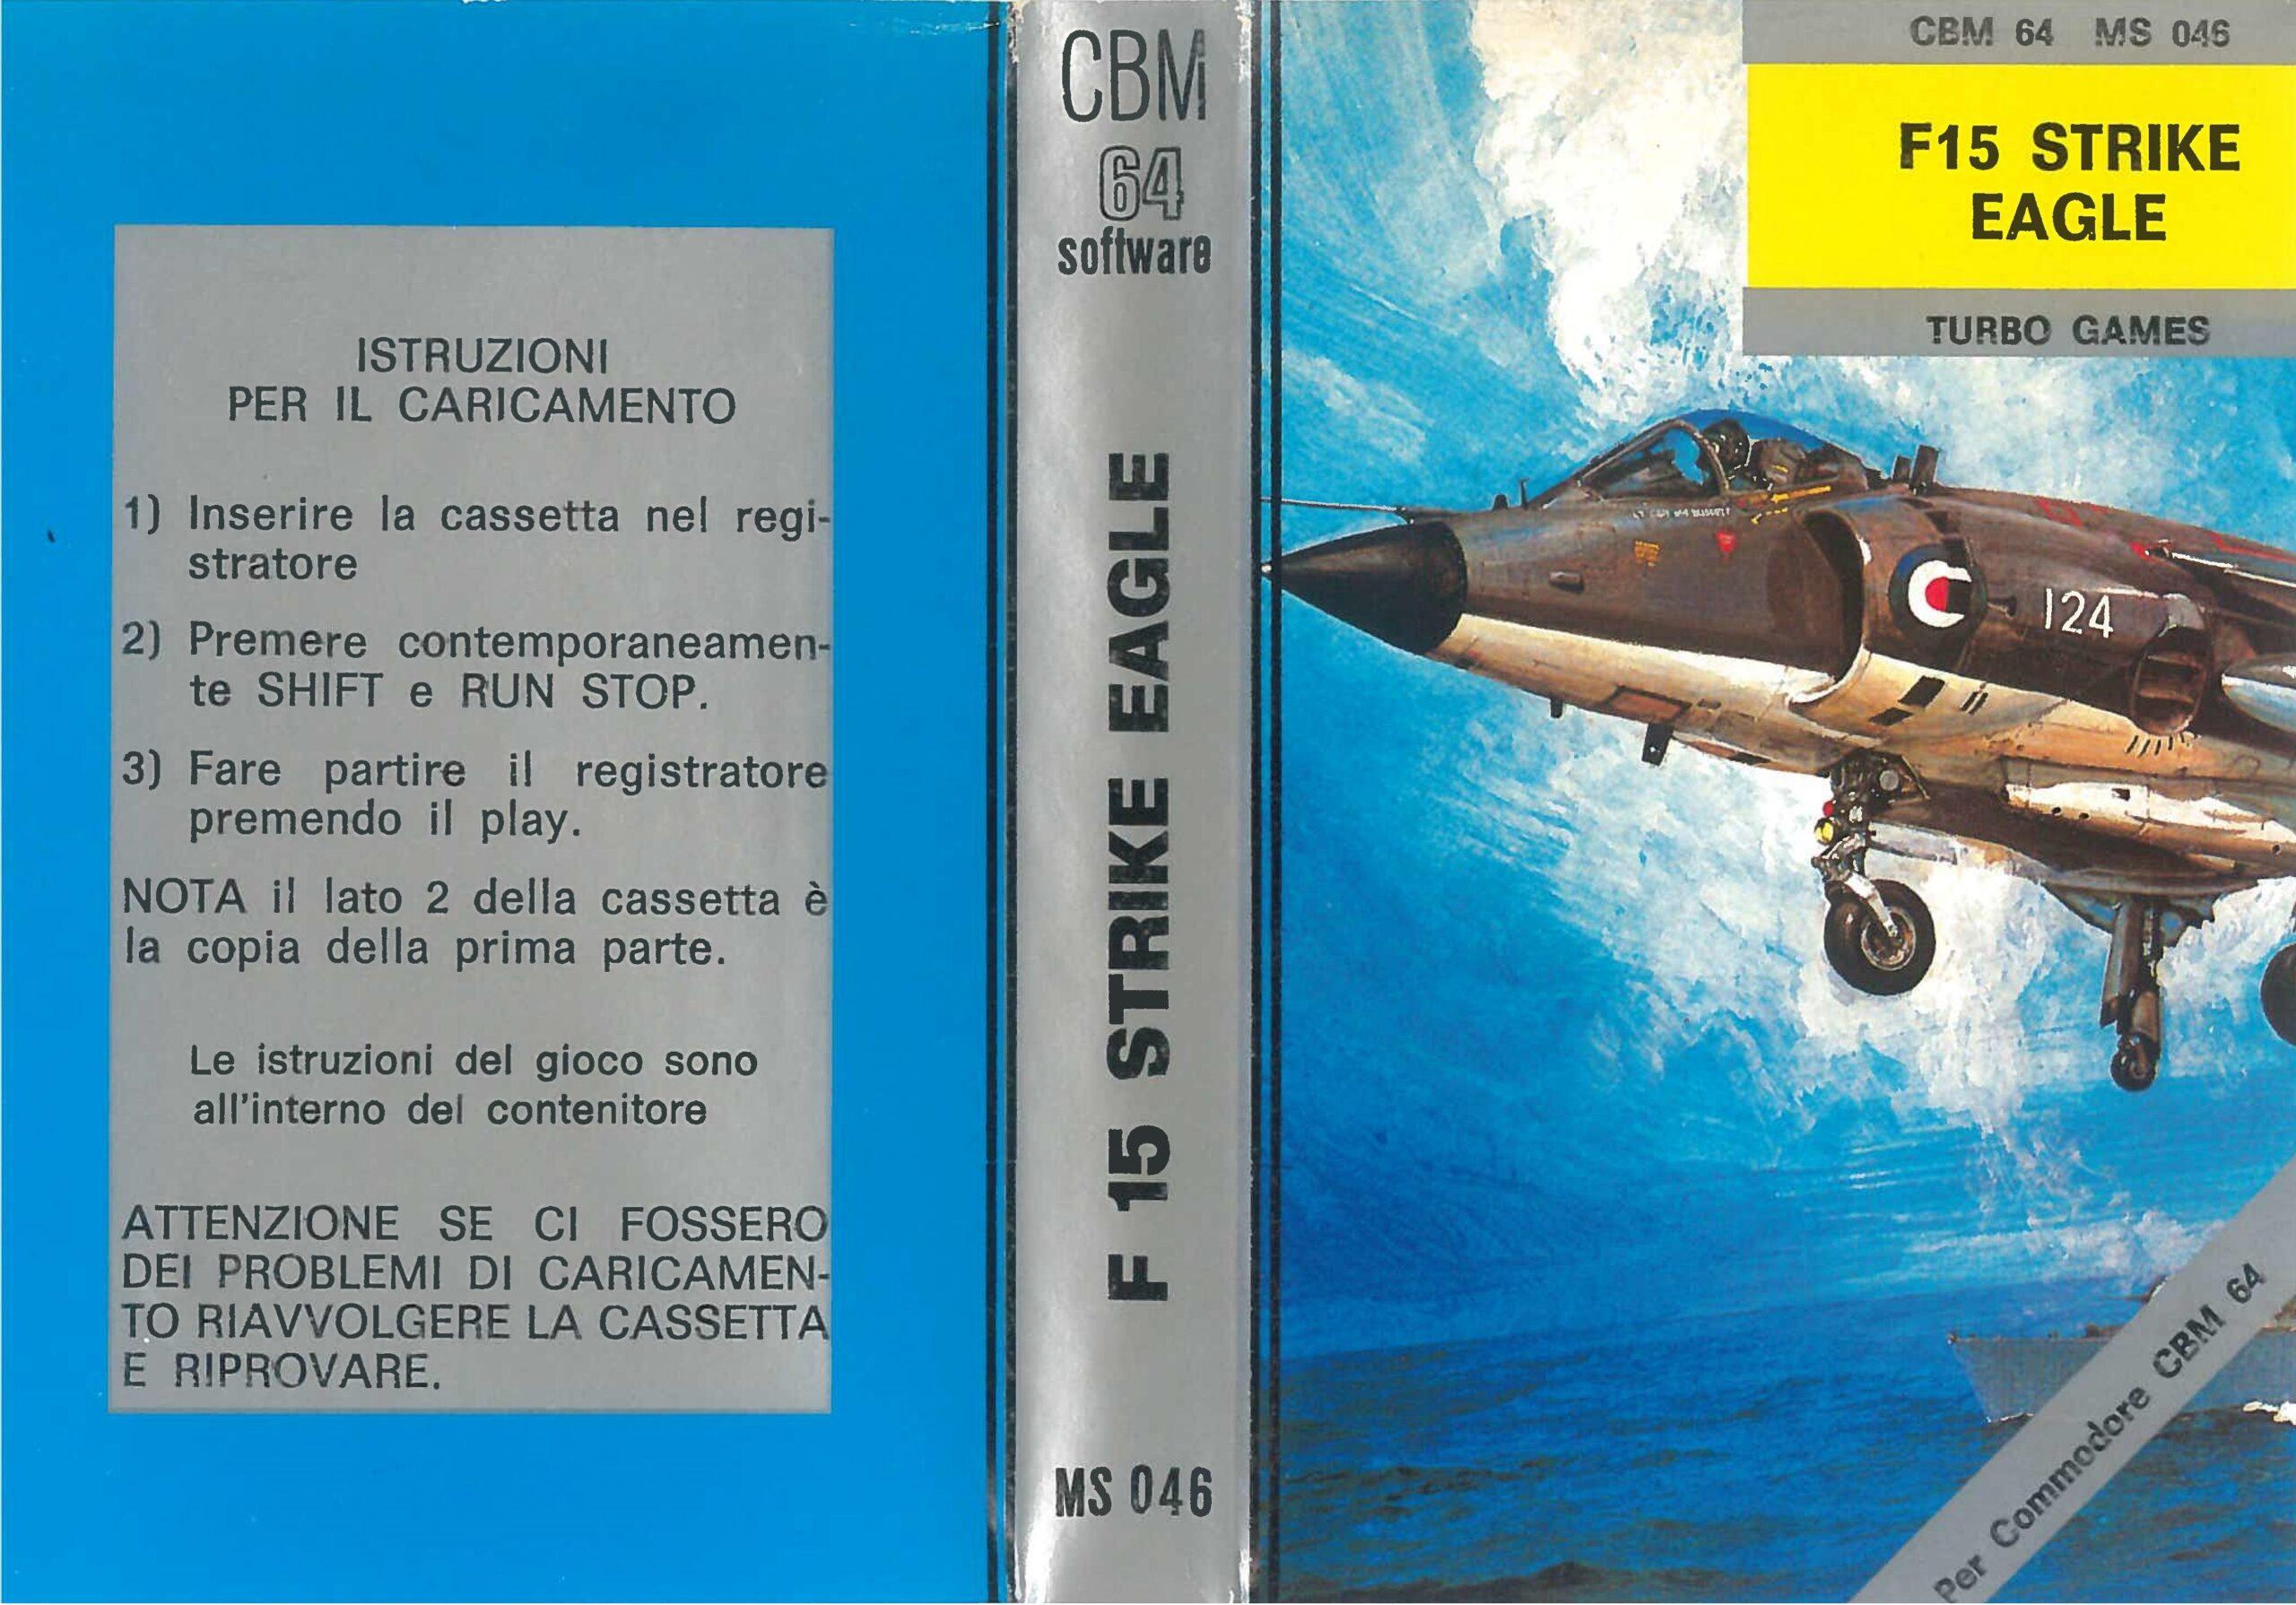 F15 STRIKE EAGLE MS 046